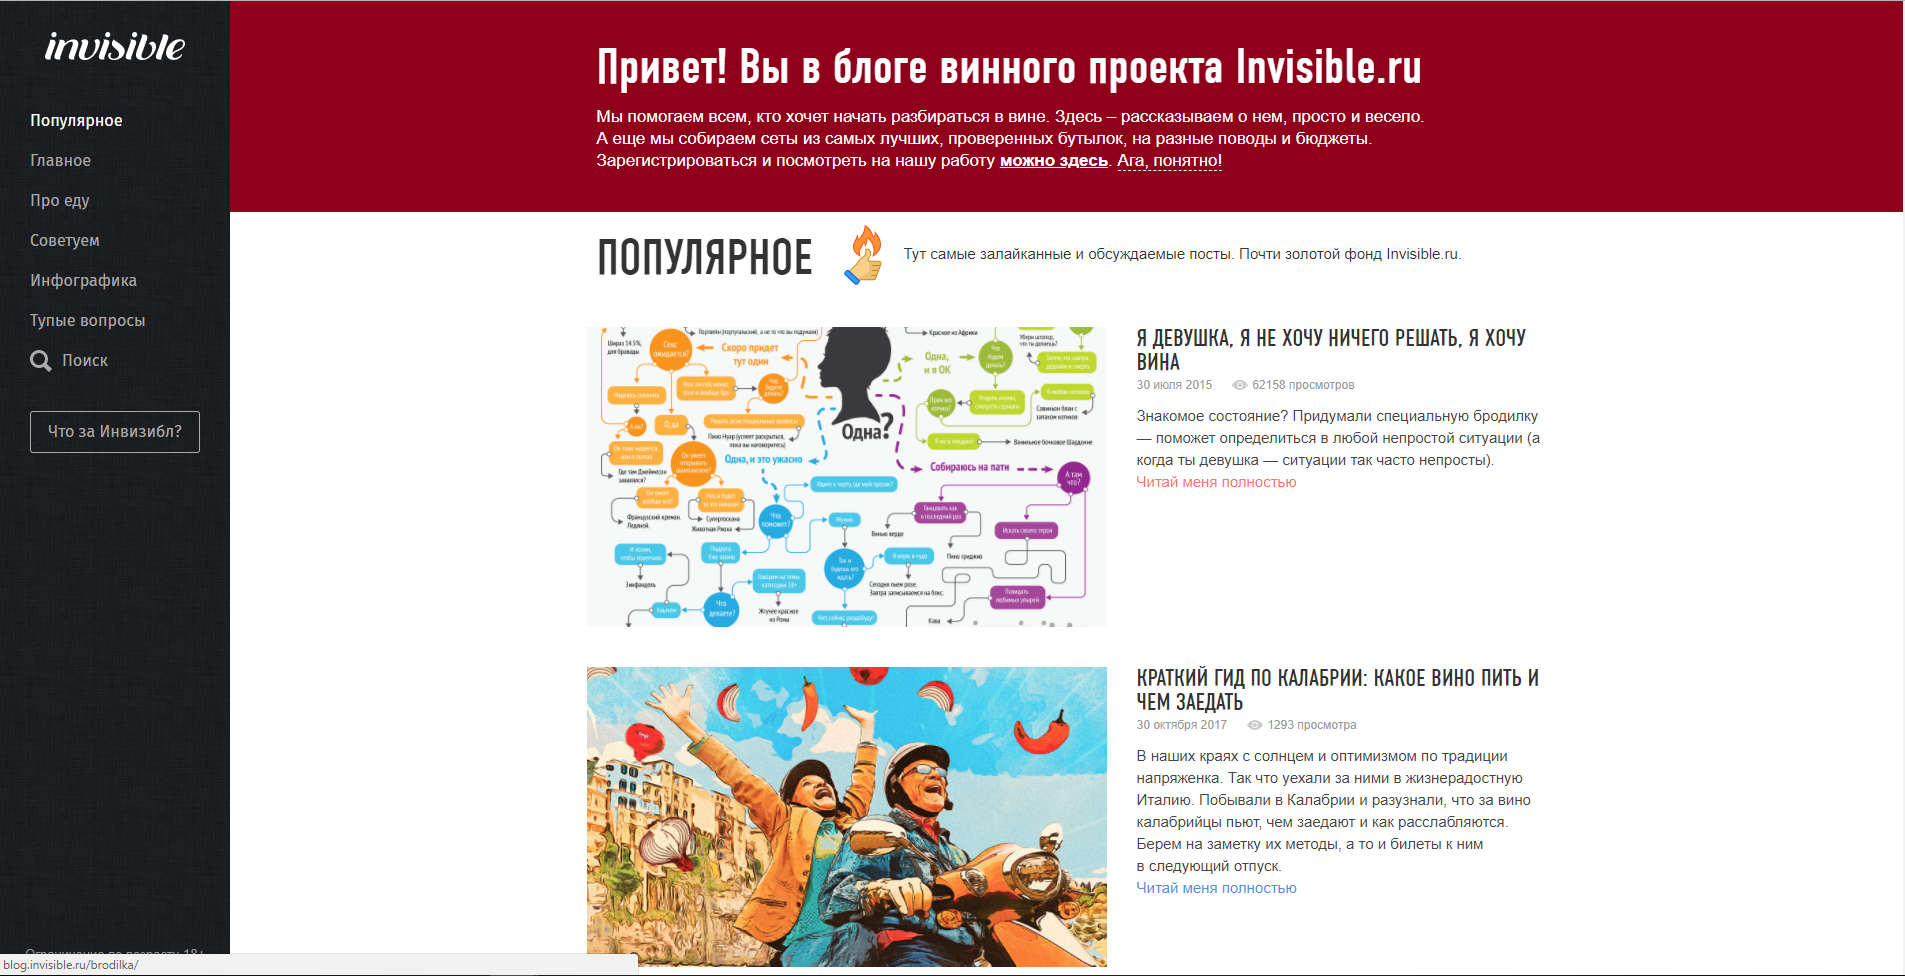 Корпоративный блог винного проекта Invisible.ru